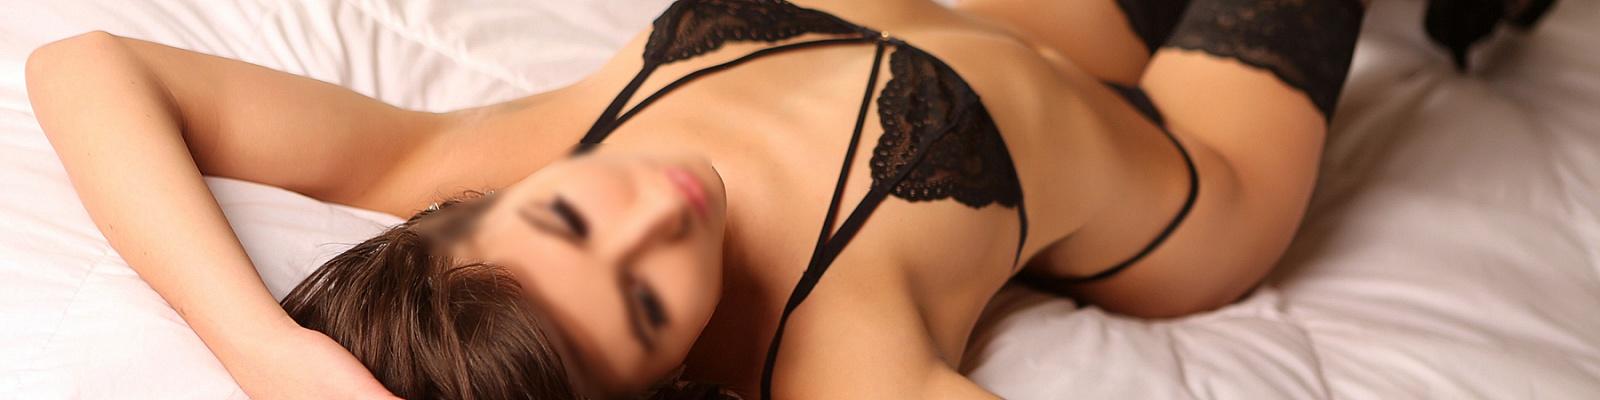 Leyla Grey's Cover Photo